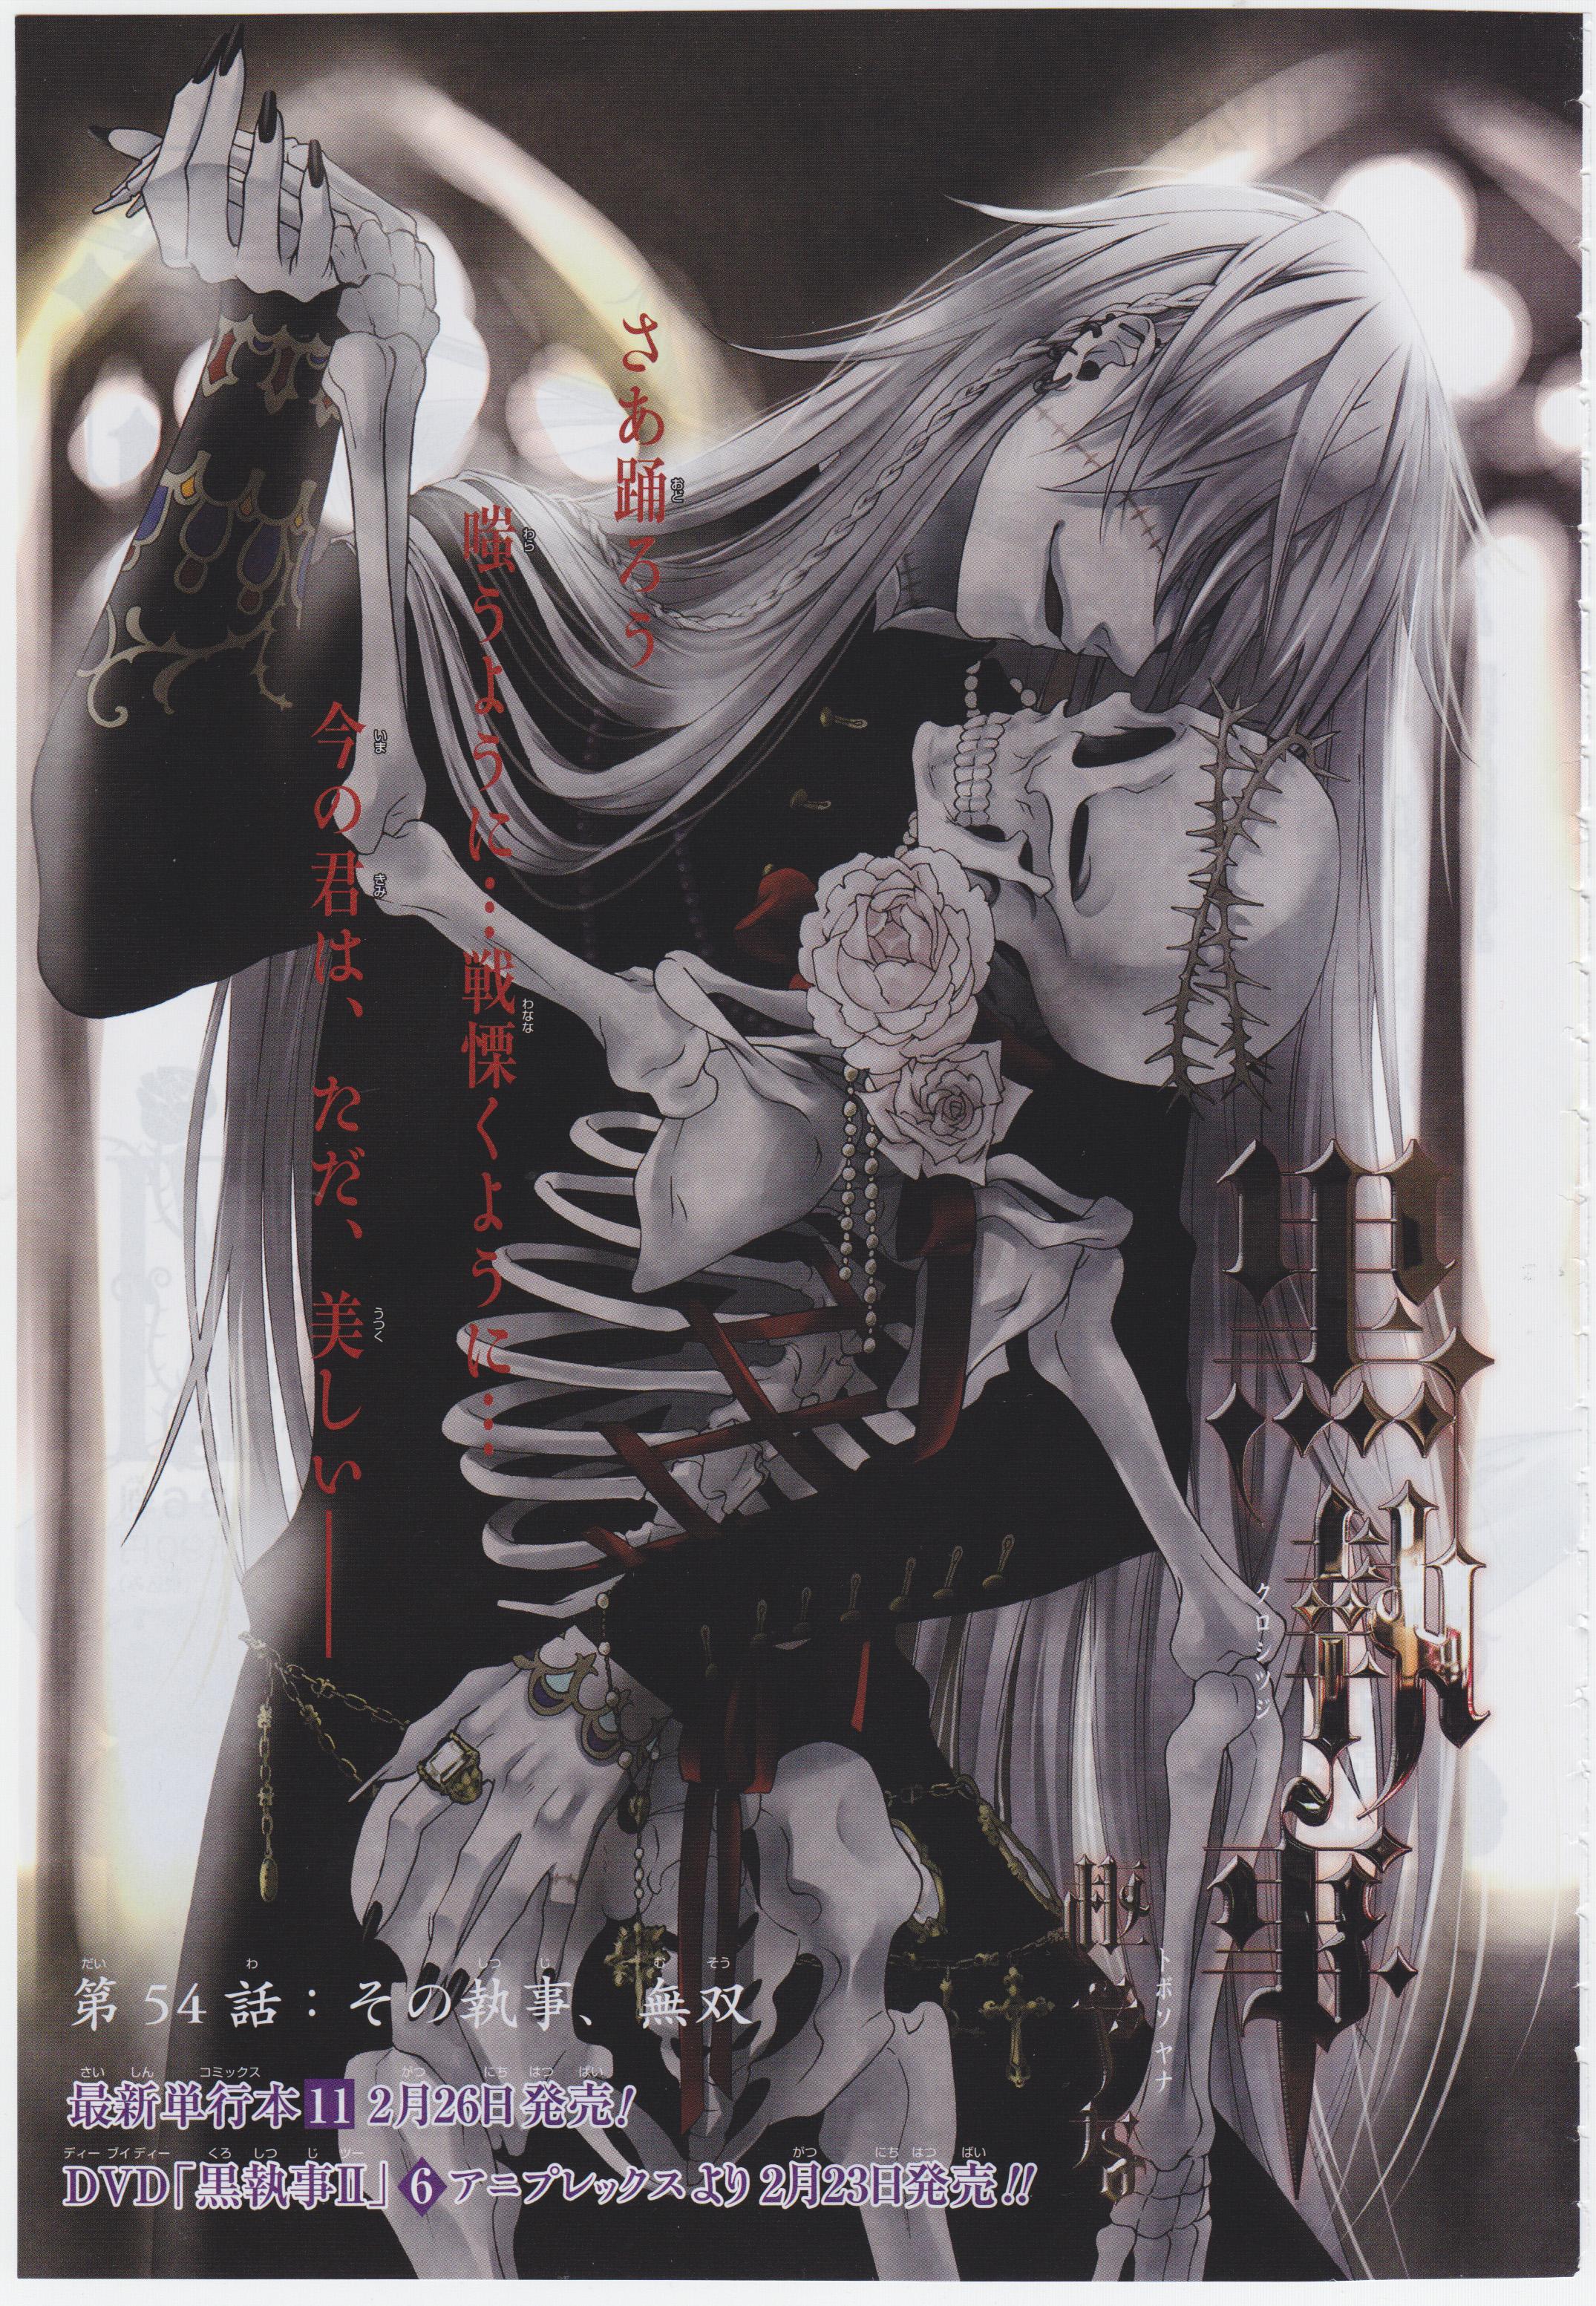 Undertaker · download Undertaker image